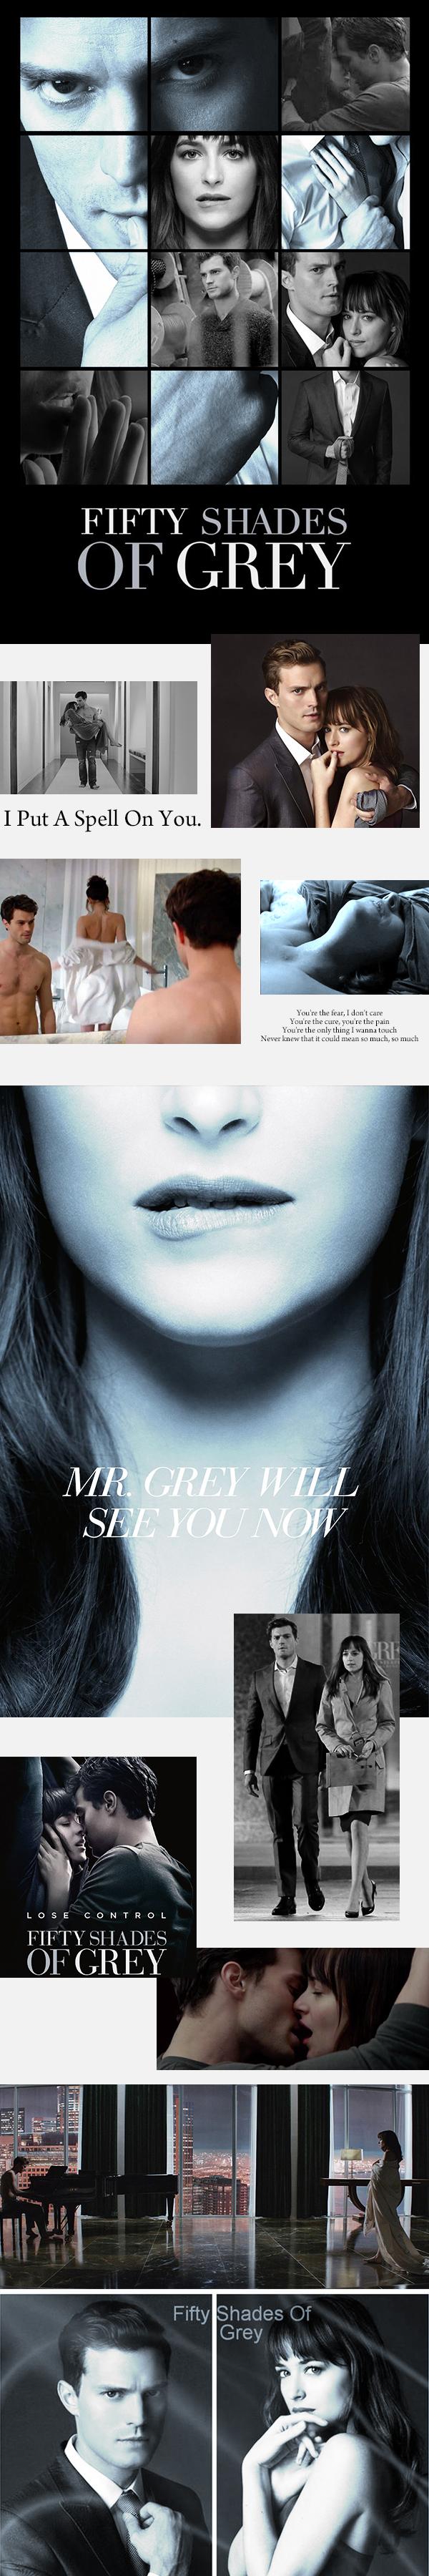 Fifty Shades Of Grey 格雷的五十道陰影 仍然是寶貝 綑綁膠帶 三件組